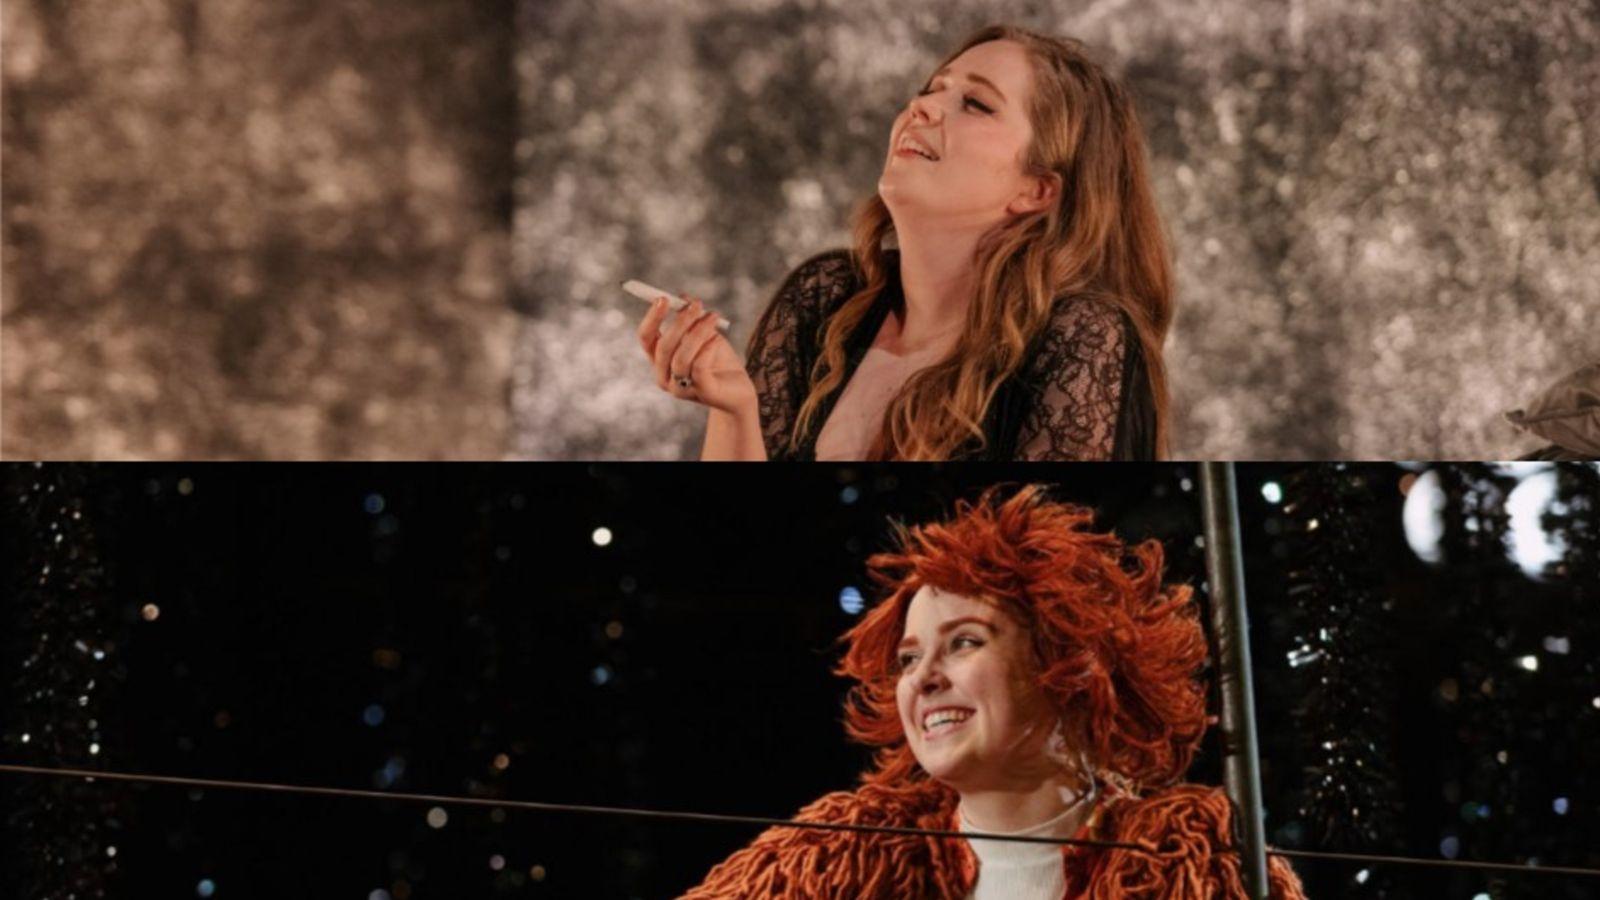 Two opera singers in costume